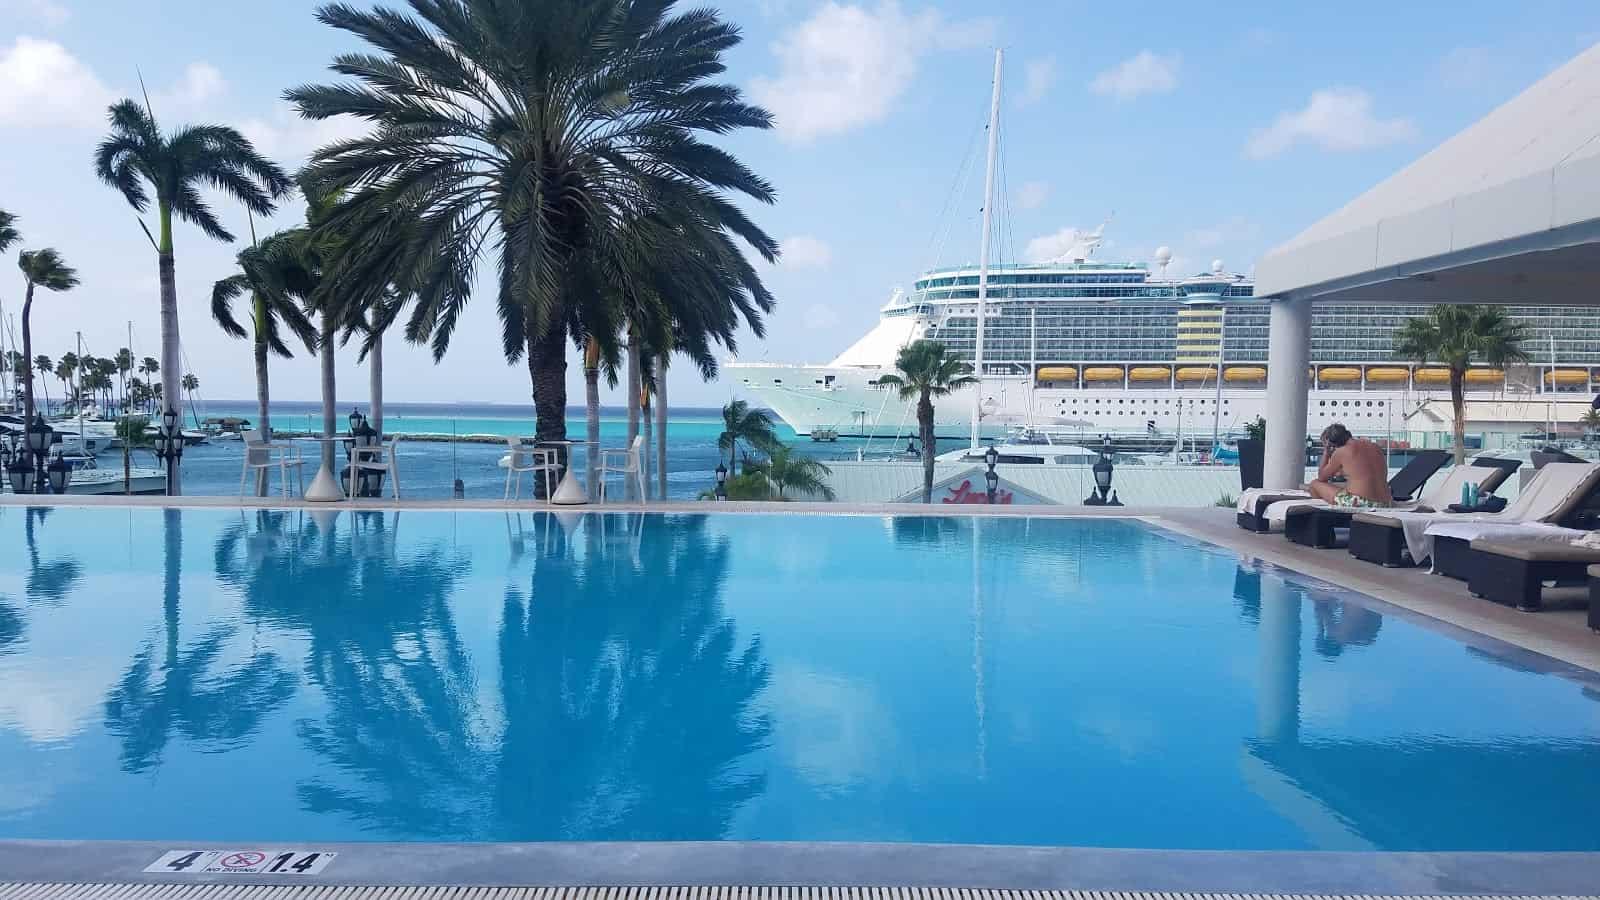 Renaissance Aruba Resort using points and miles